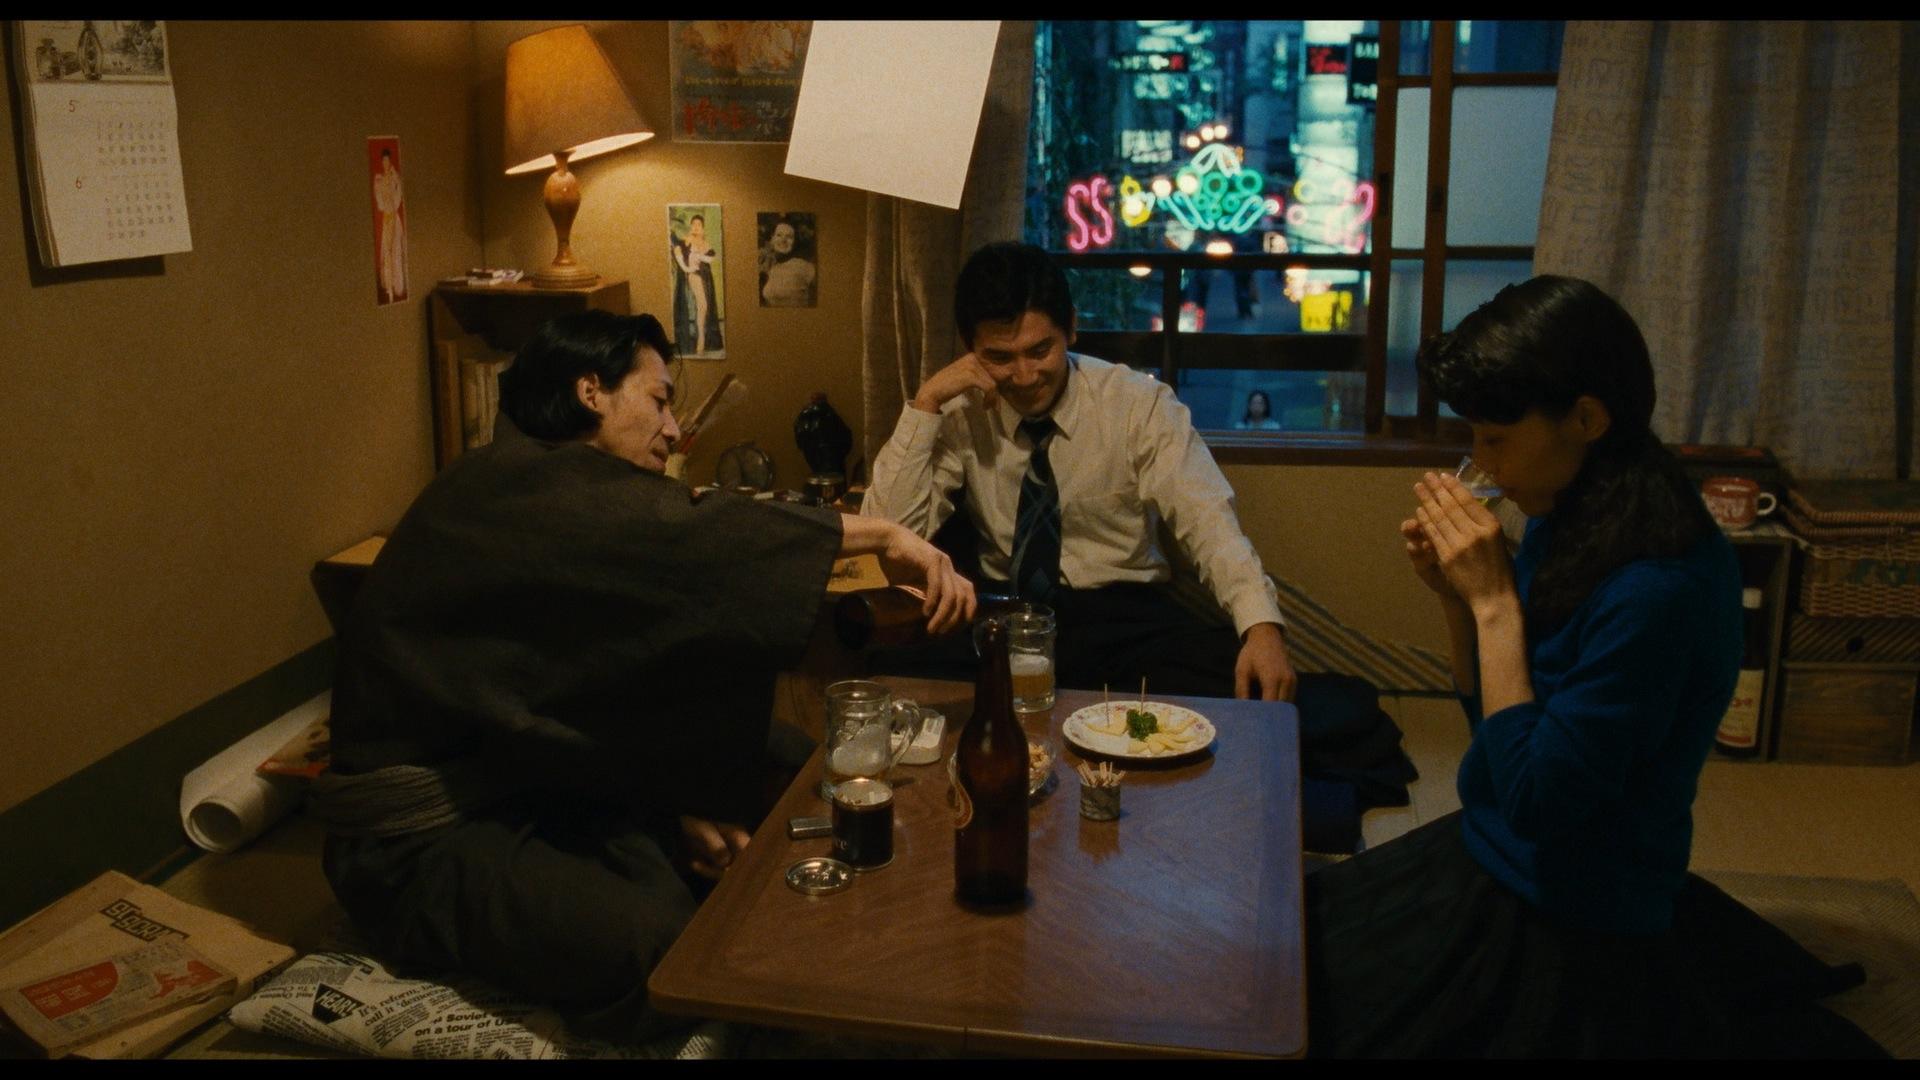 2021-09-15-Tokiwa_The_Manga_Apartment-BD-SS-03-BD.jpg